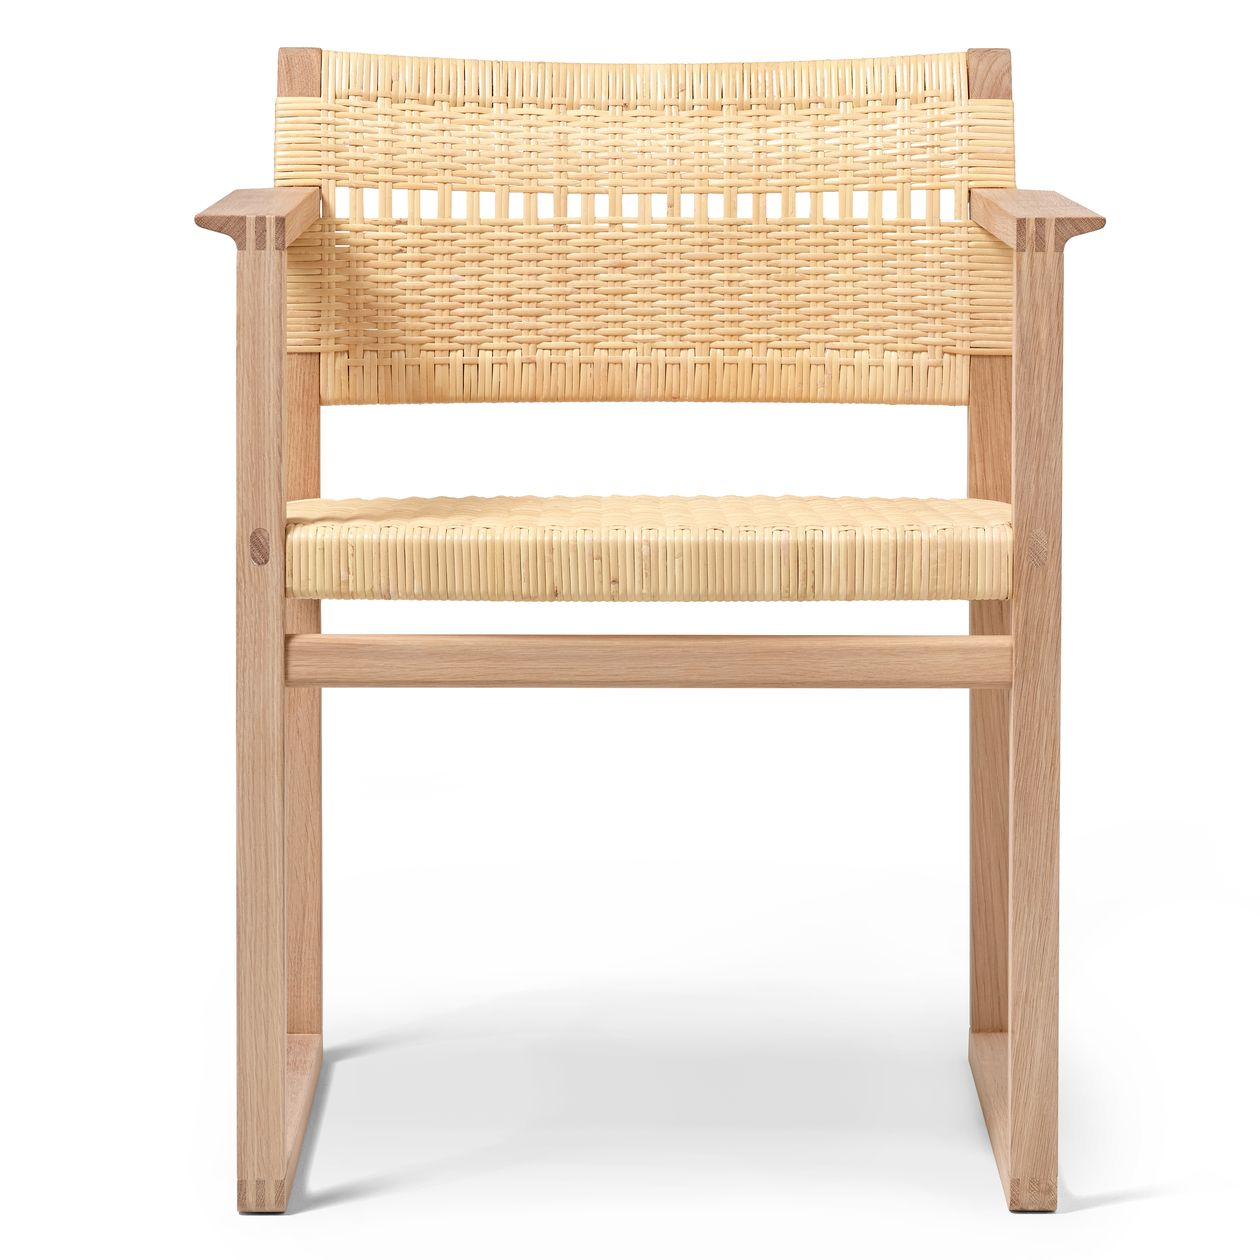 Frederician BM62-tuoli